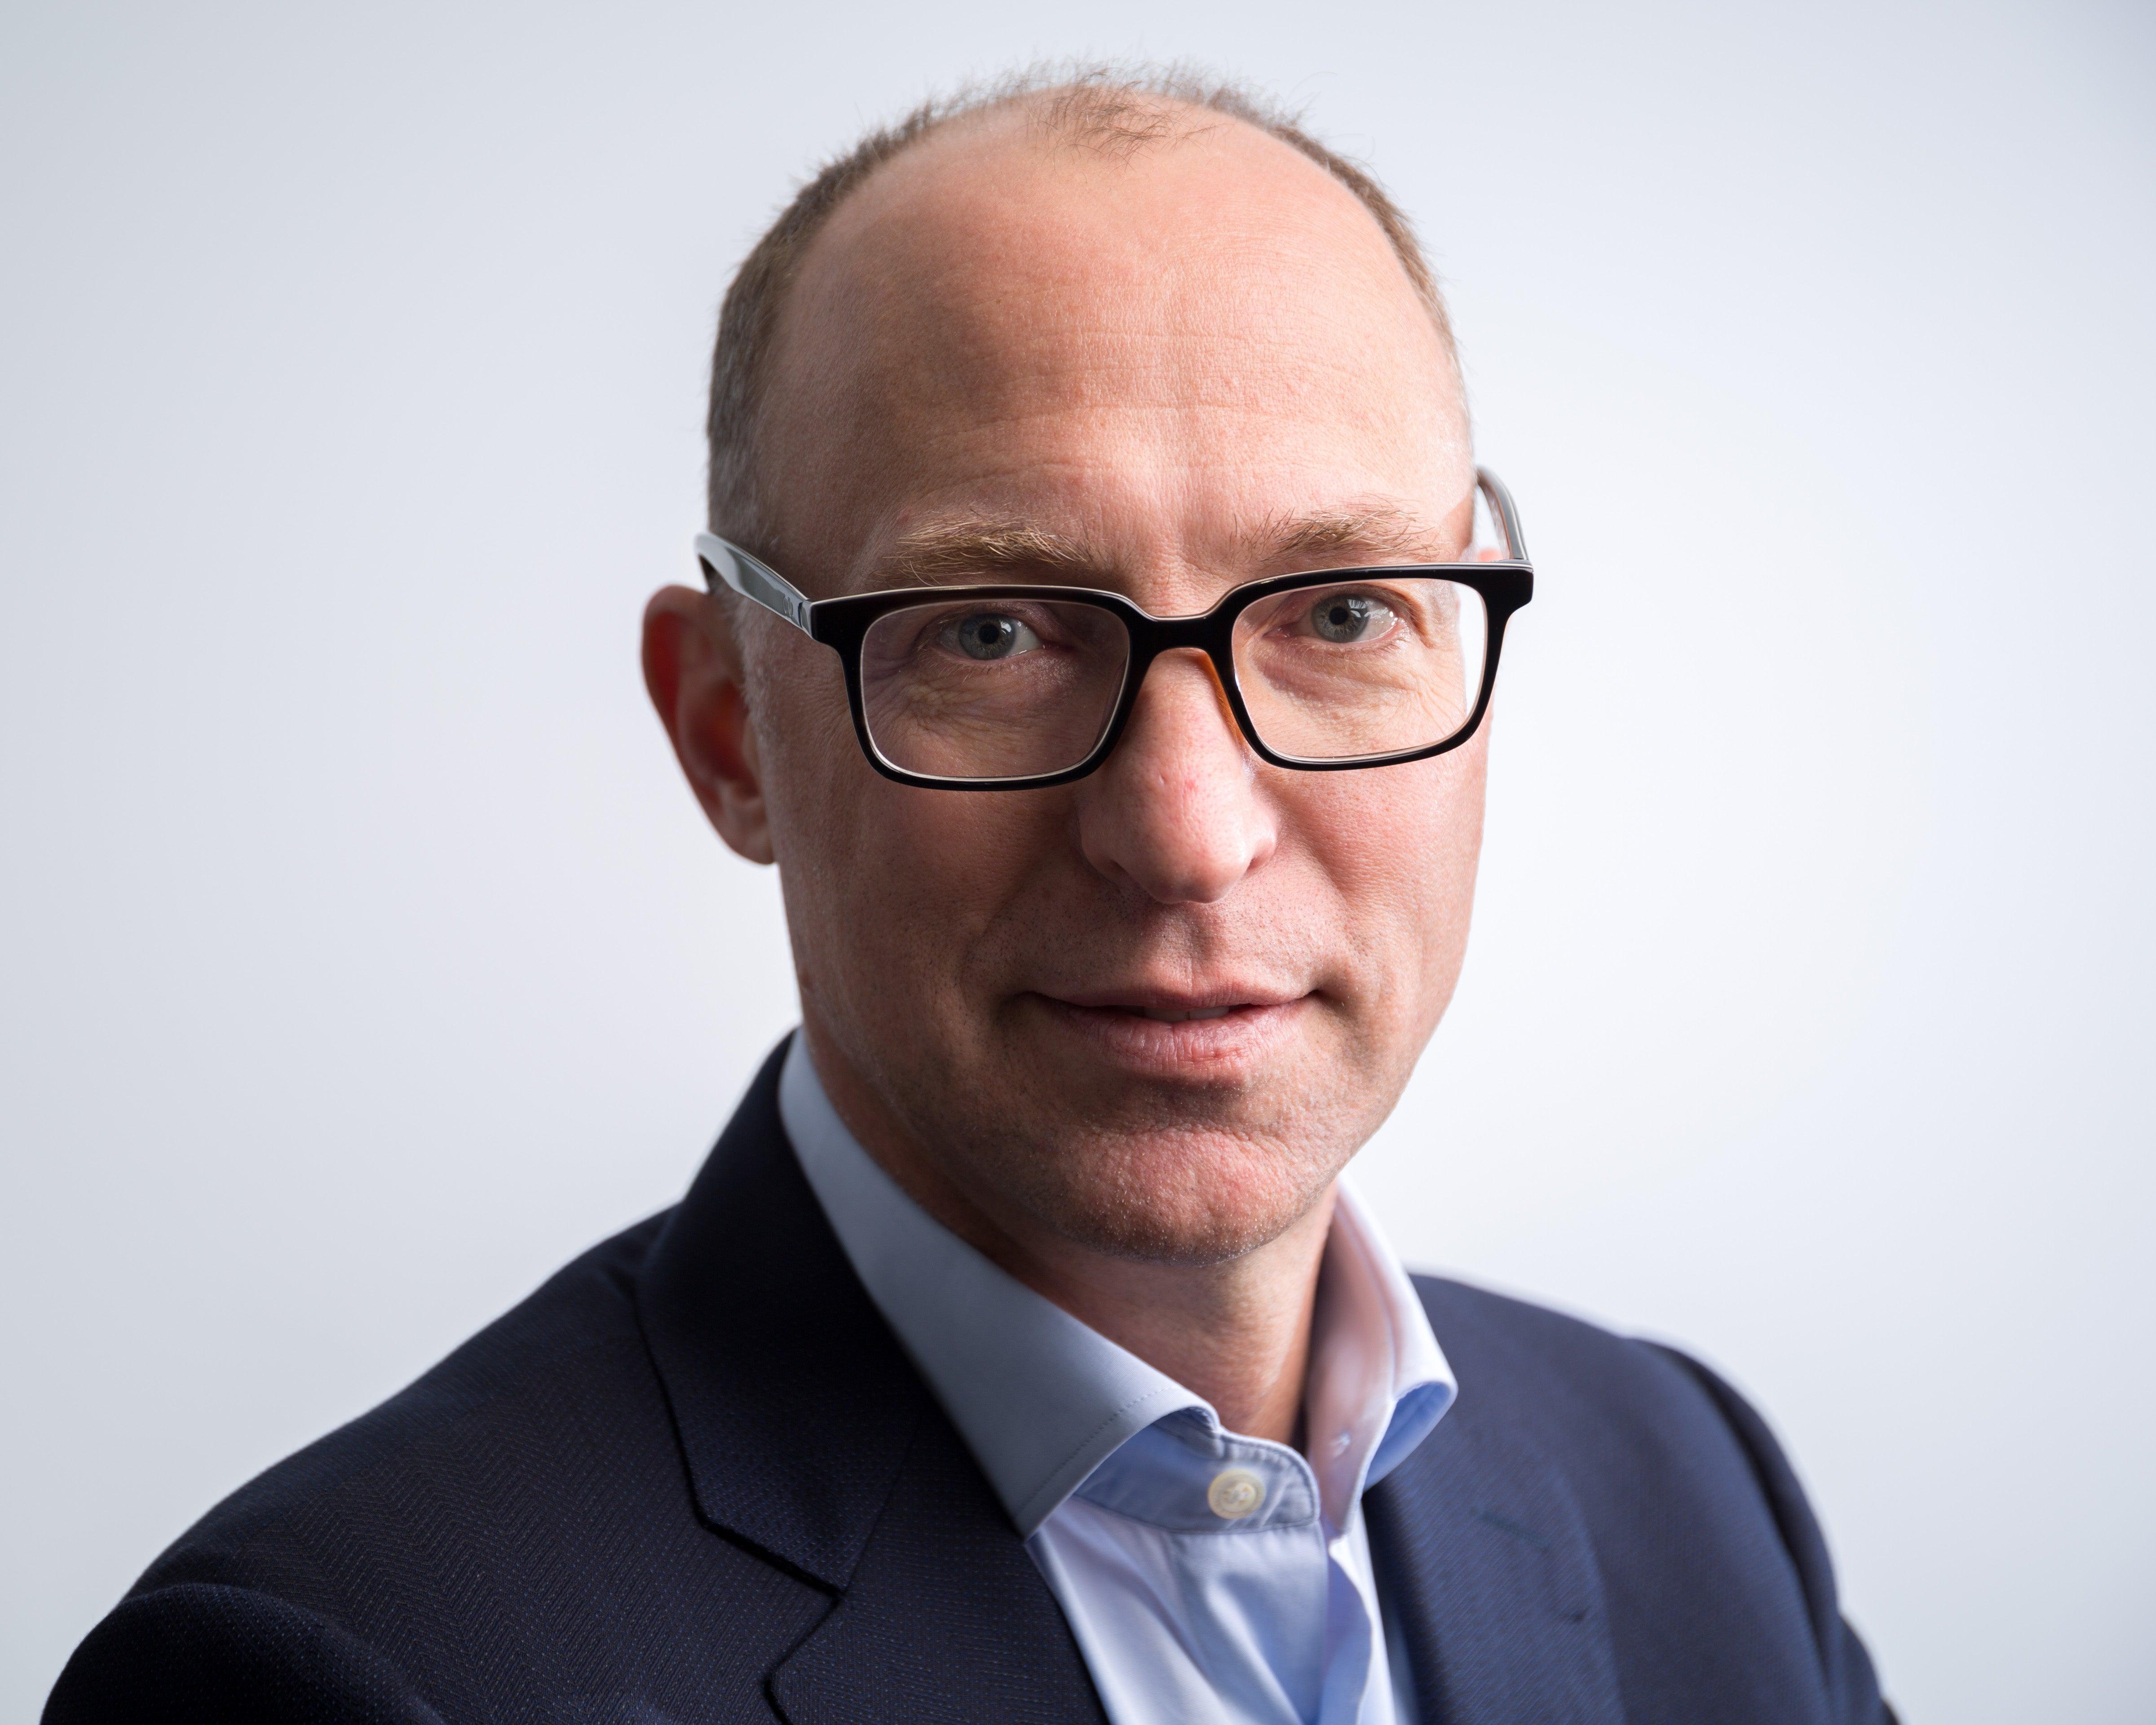 Nick Waters, Chairman, Dentsu Aegis Network, UK and Ireland